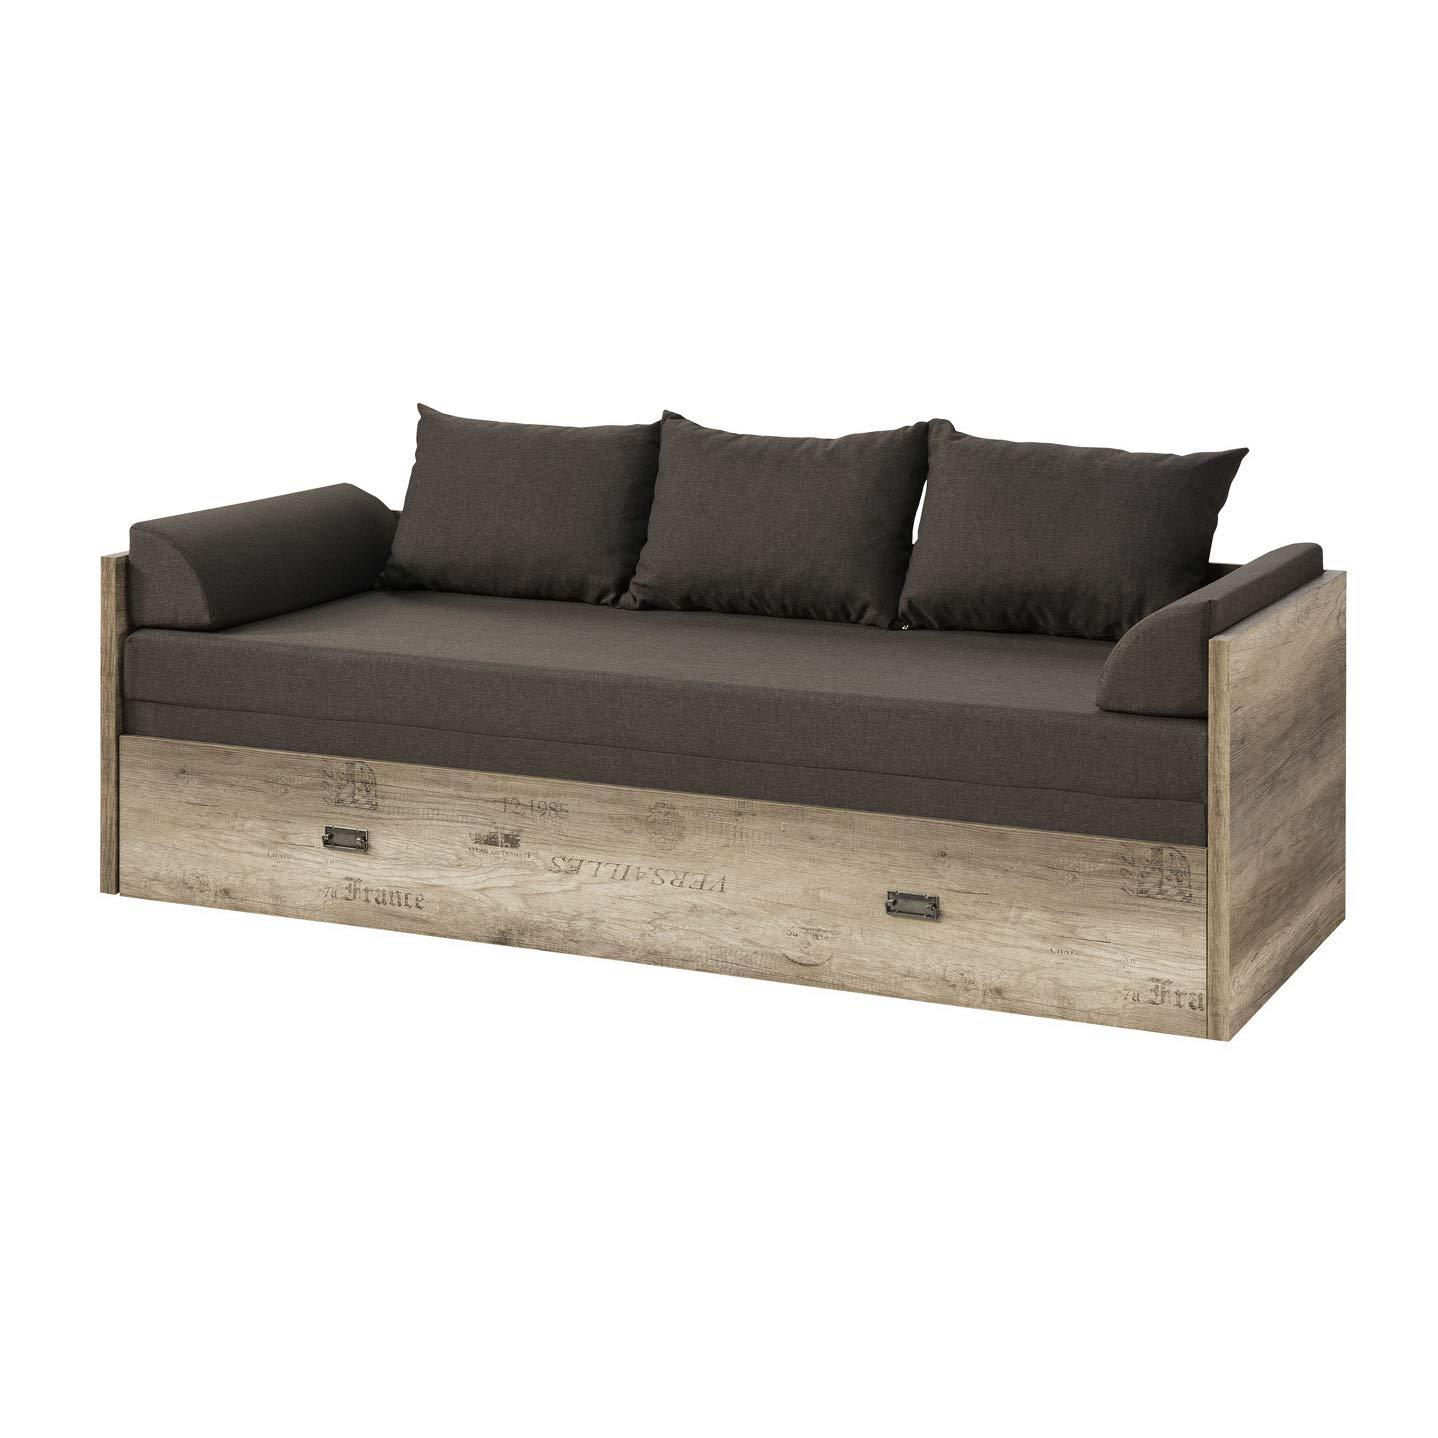 SMARTBett Smart malkolm sofá Cama Extensible 80/160 en Color ...